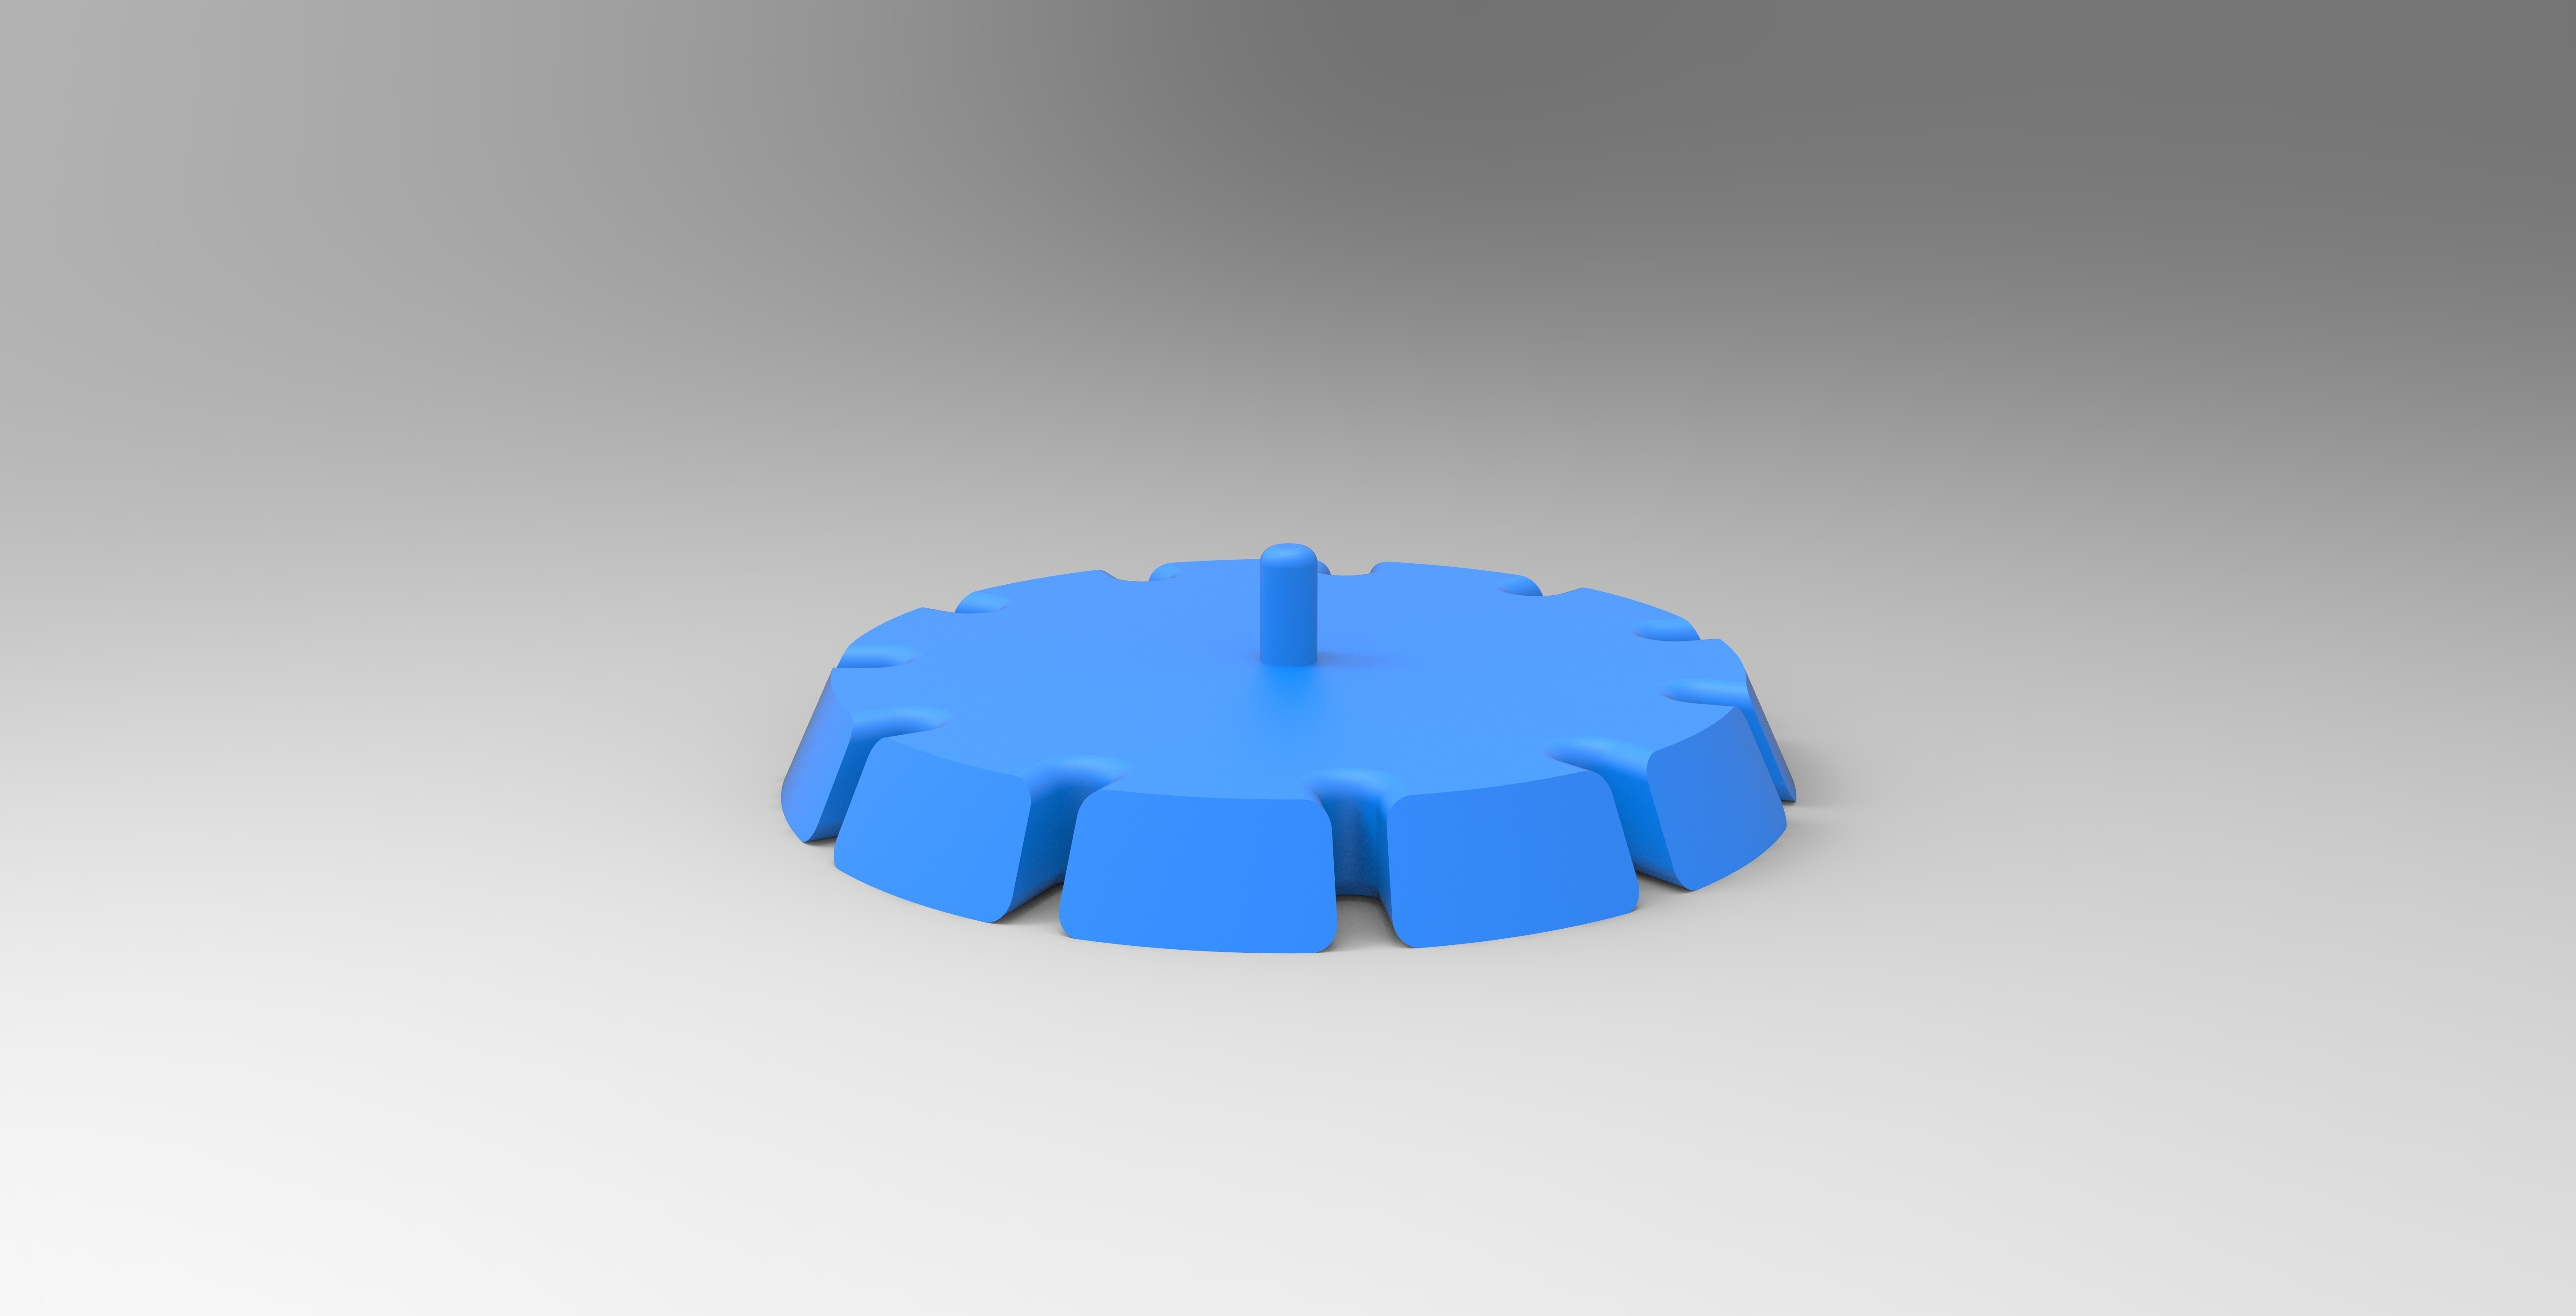 egrthjykuk.jpg Download STL file HELP CUTTING CAKE PART CUTTING • 3D printer object, GuilhemPerroud